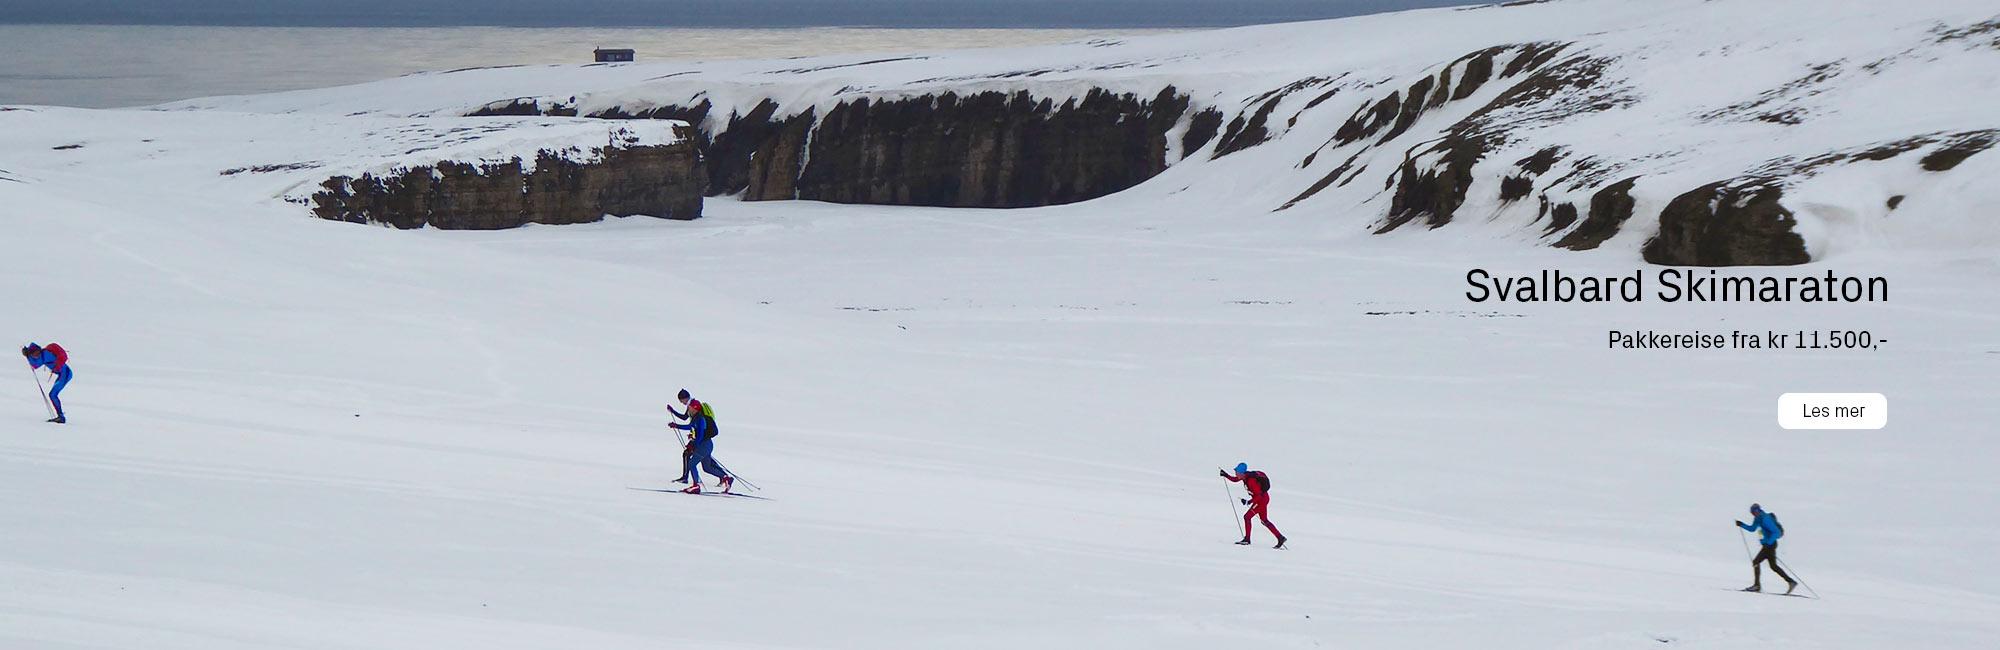 Foto: Svalbard Turn